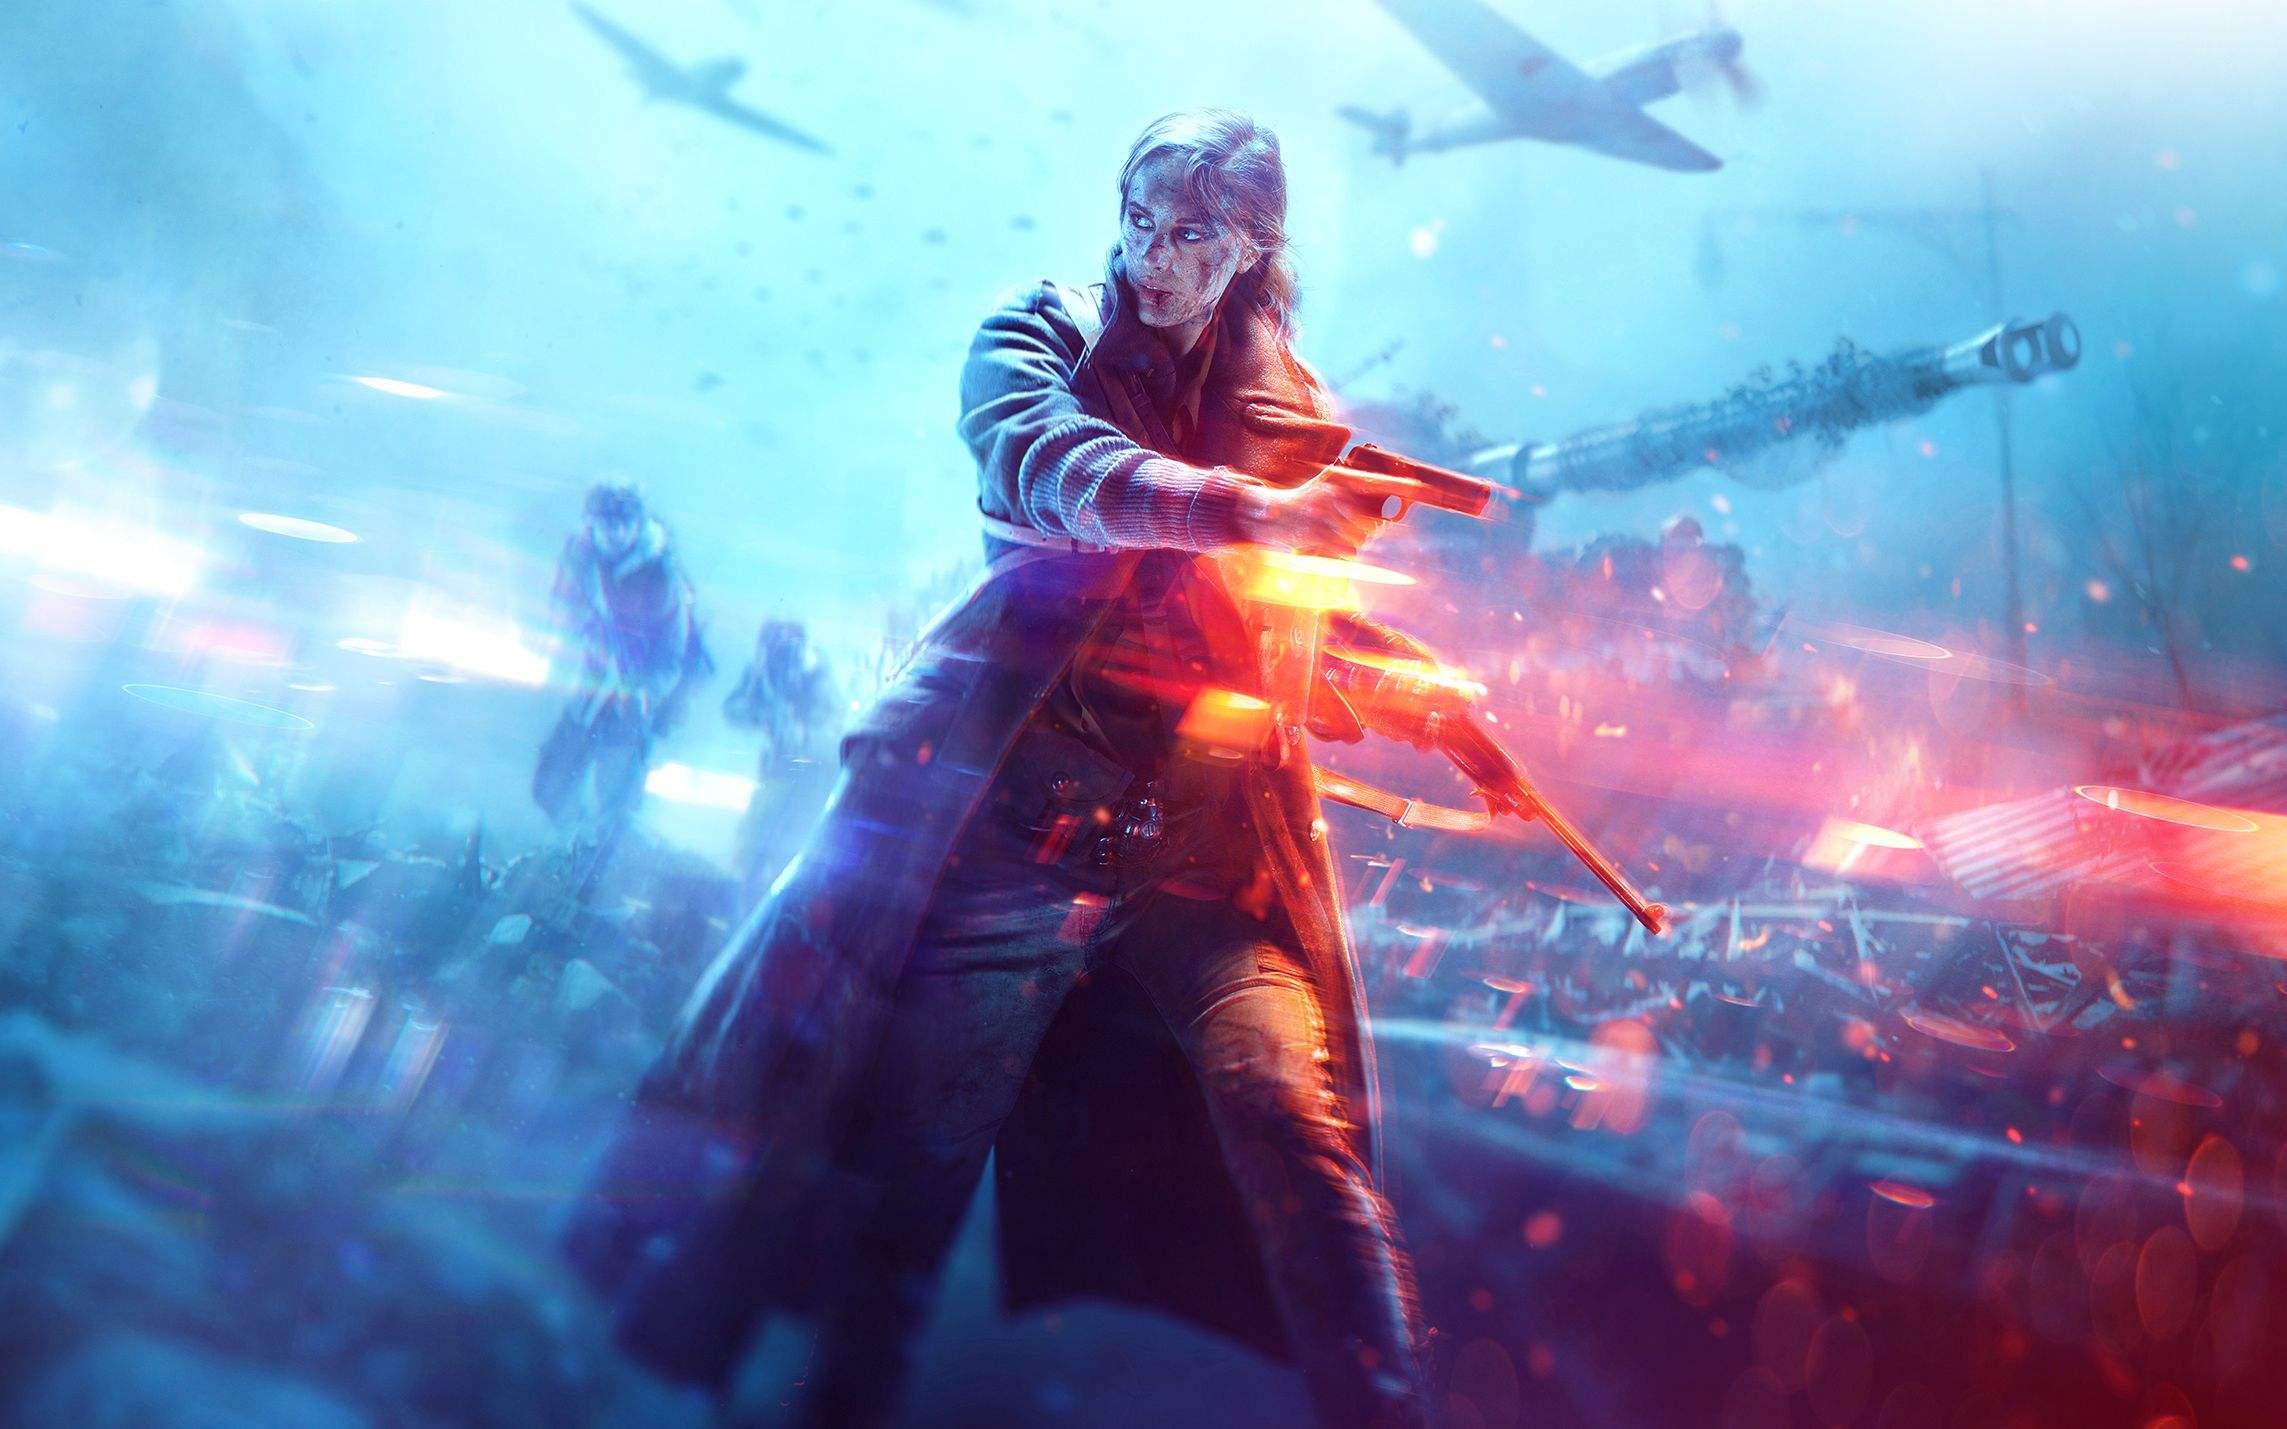 EA Origin开启特惠活动 领取会员免费玩7天《战地5》